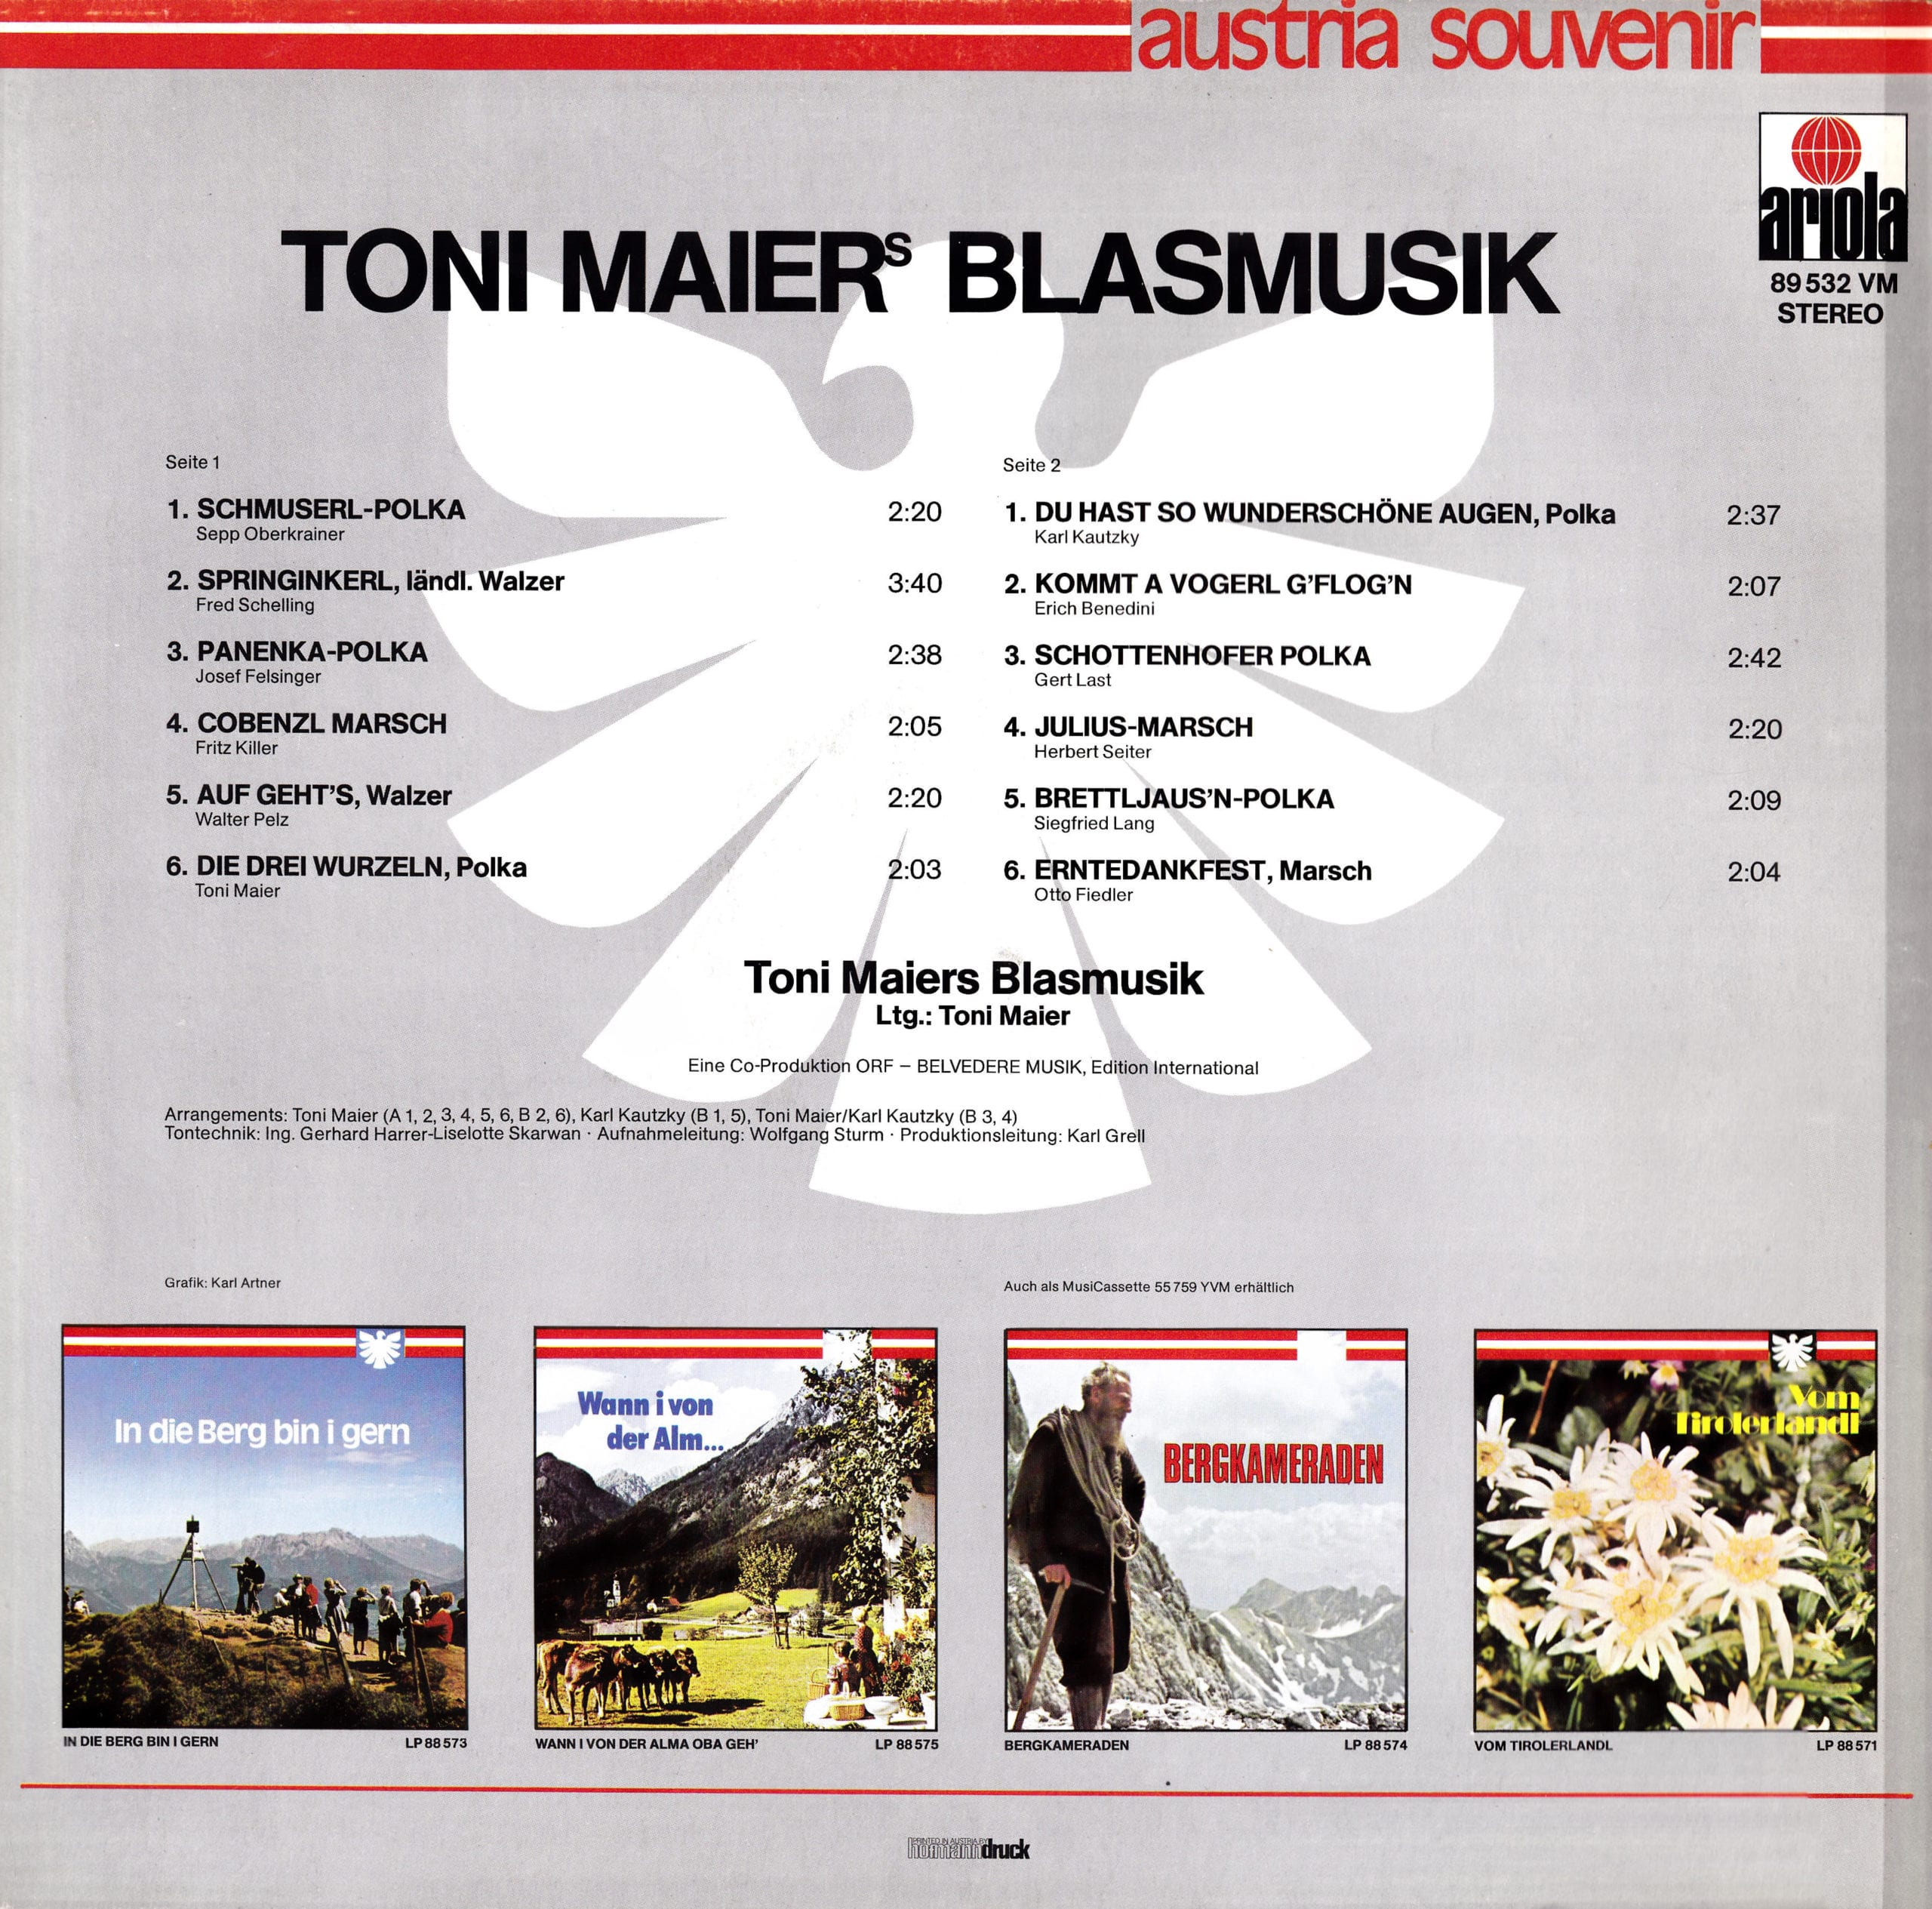 Toni Maiers Blasmusik – 2